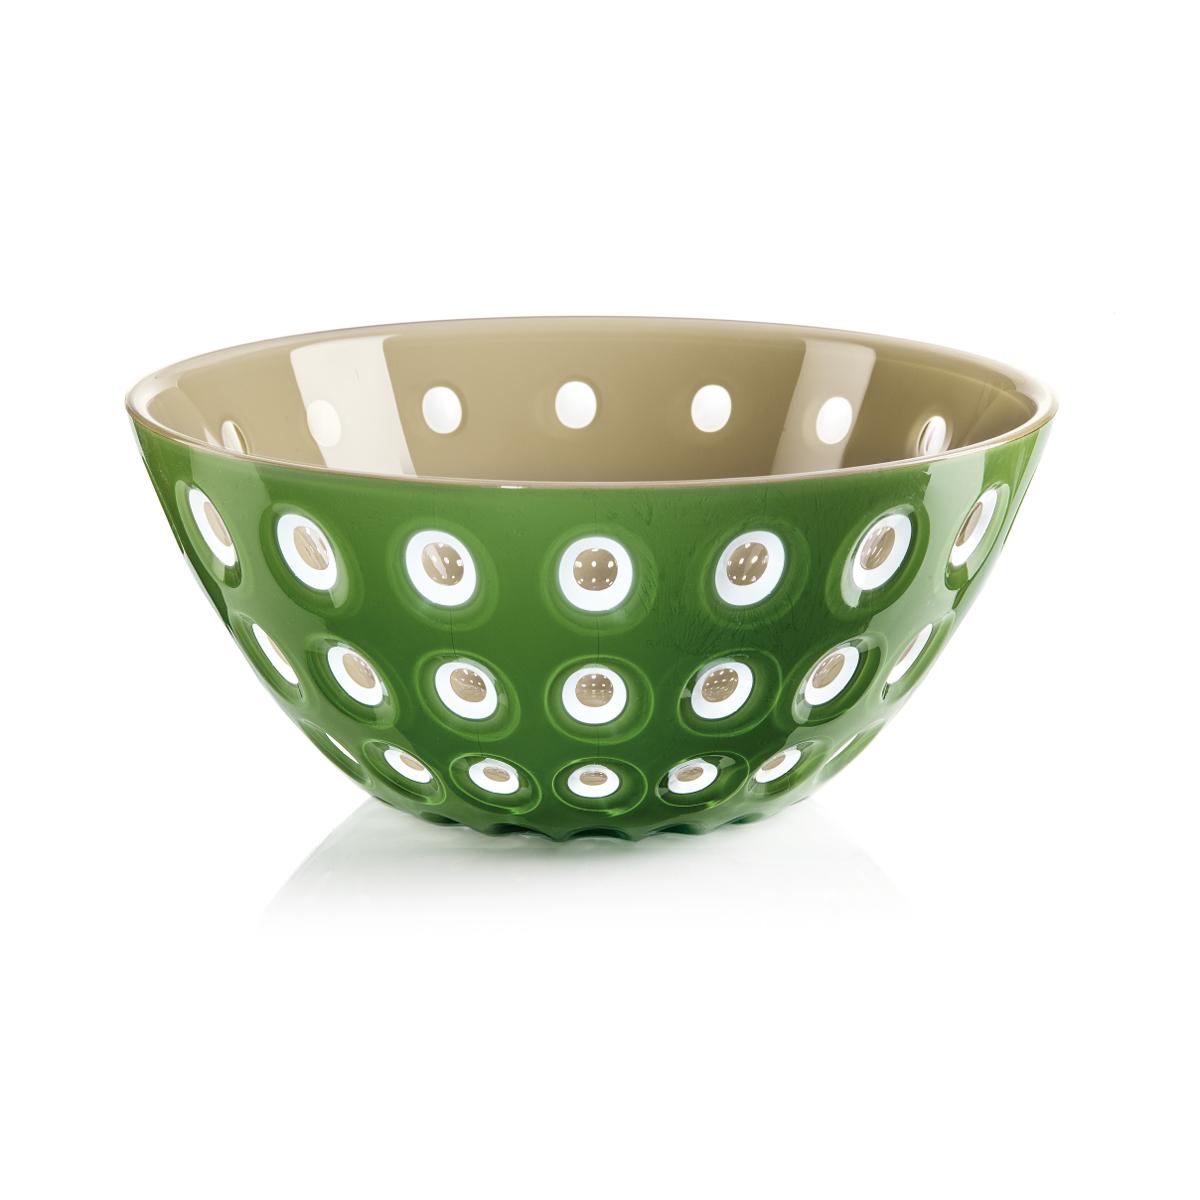 Guzzini Le Murrine Moss Green and Sand 9.8 Inch Bowl